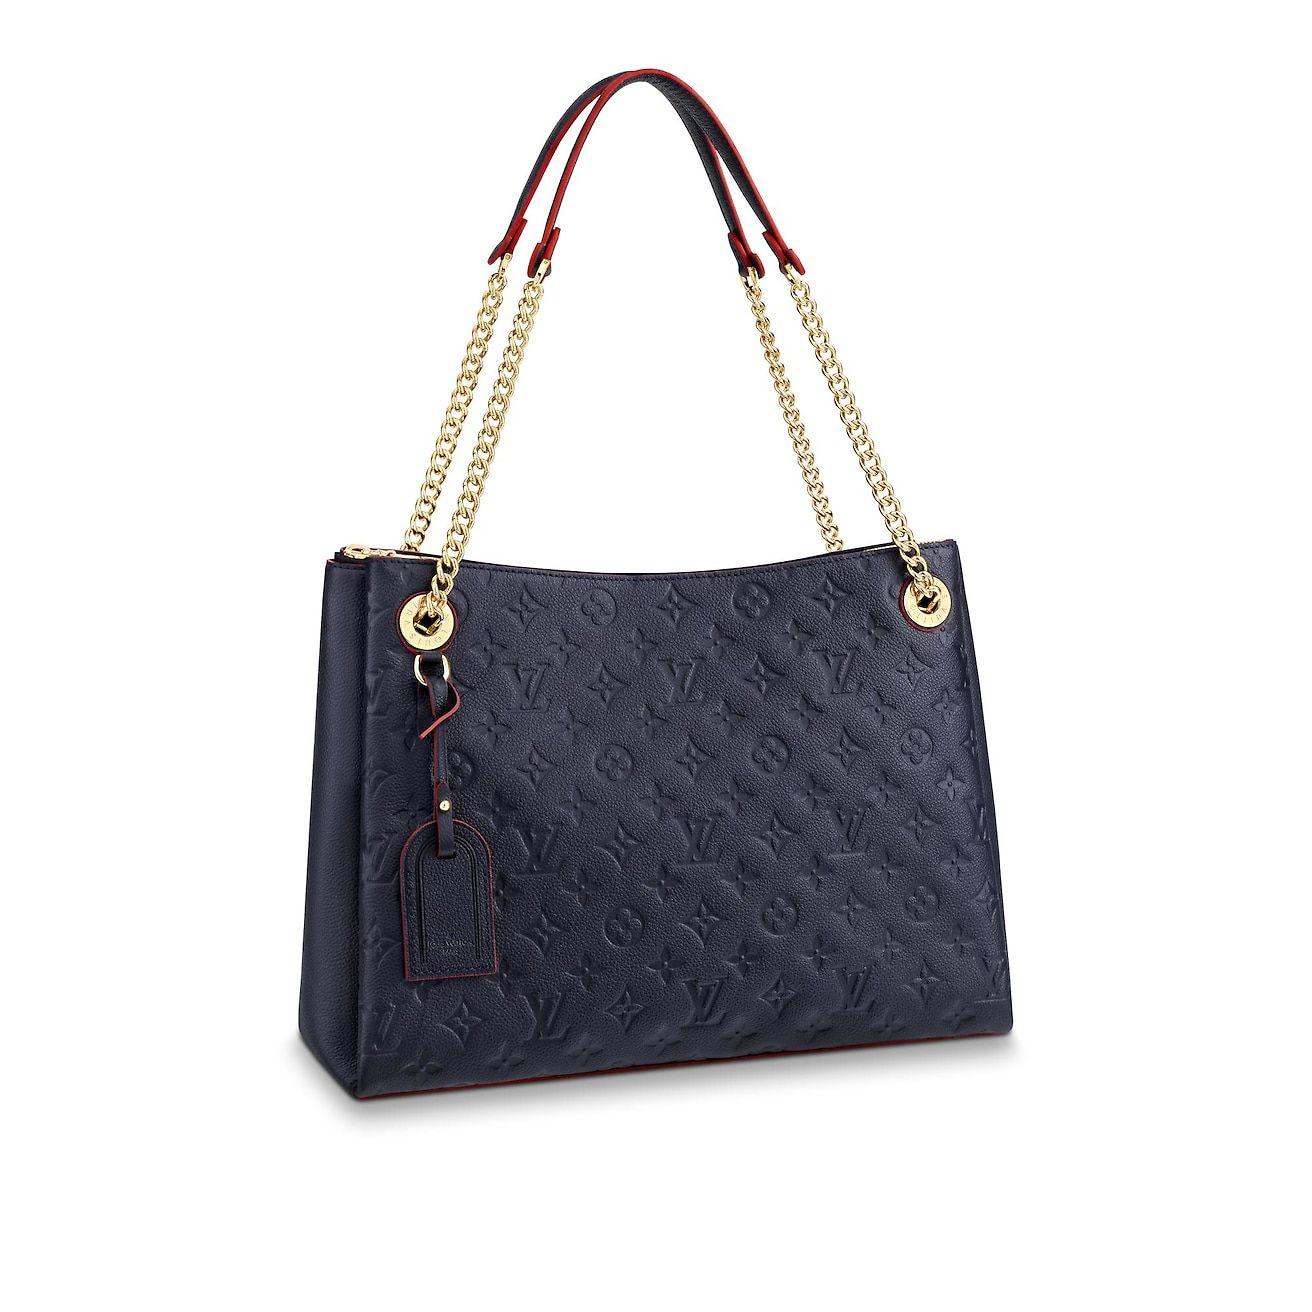 ac8e8843a2db View 1 - Monogram Empreinte Leather HANDBAGS All Handbags Surene MM ...